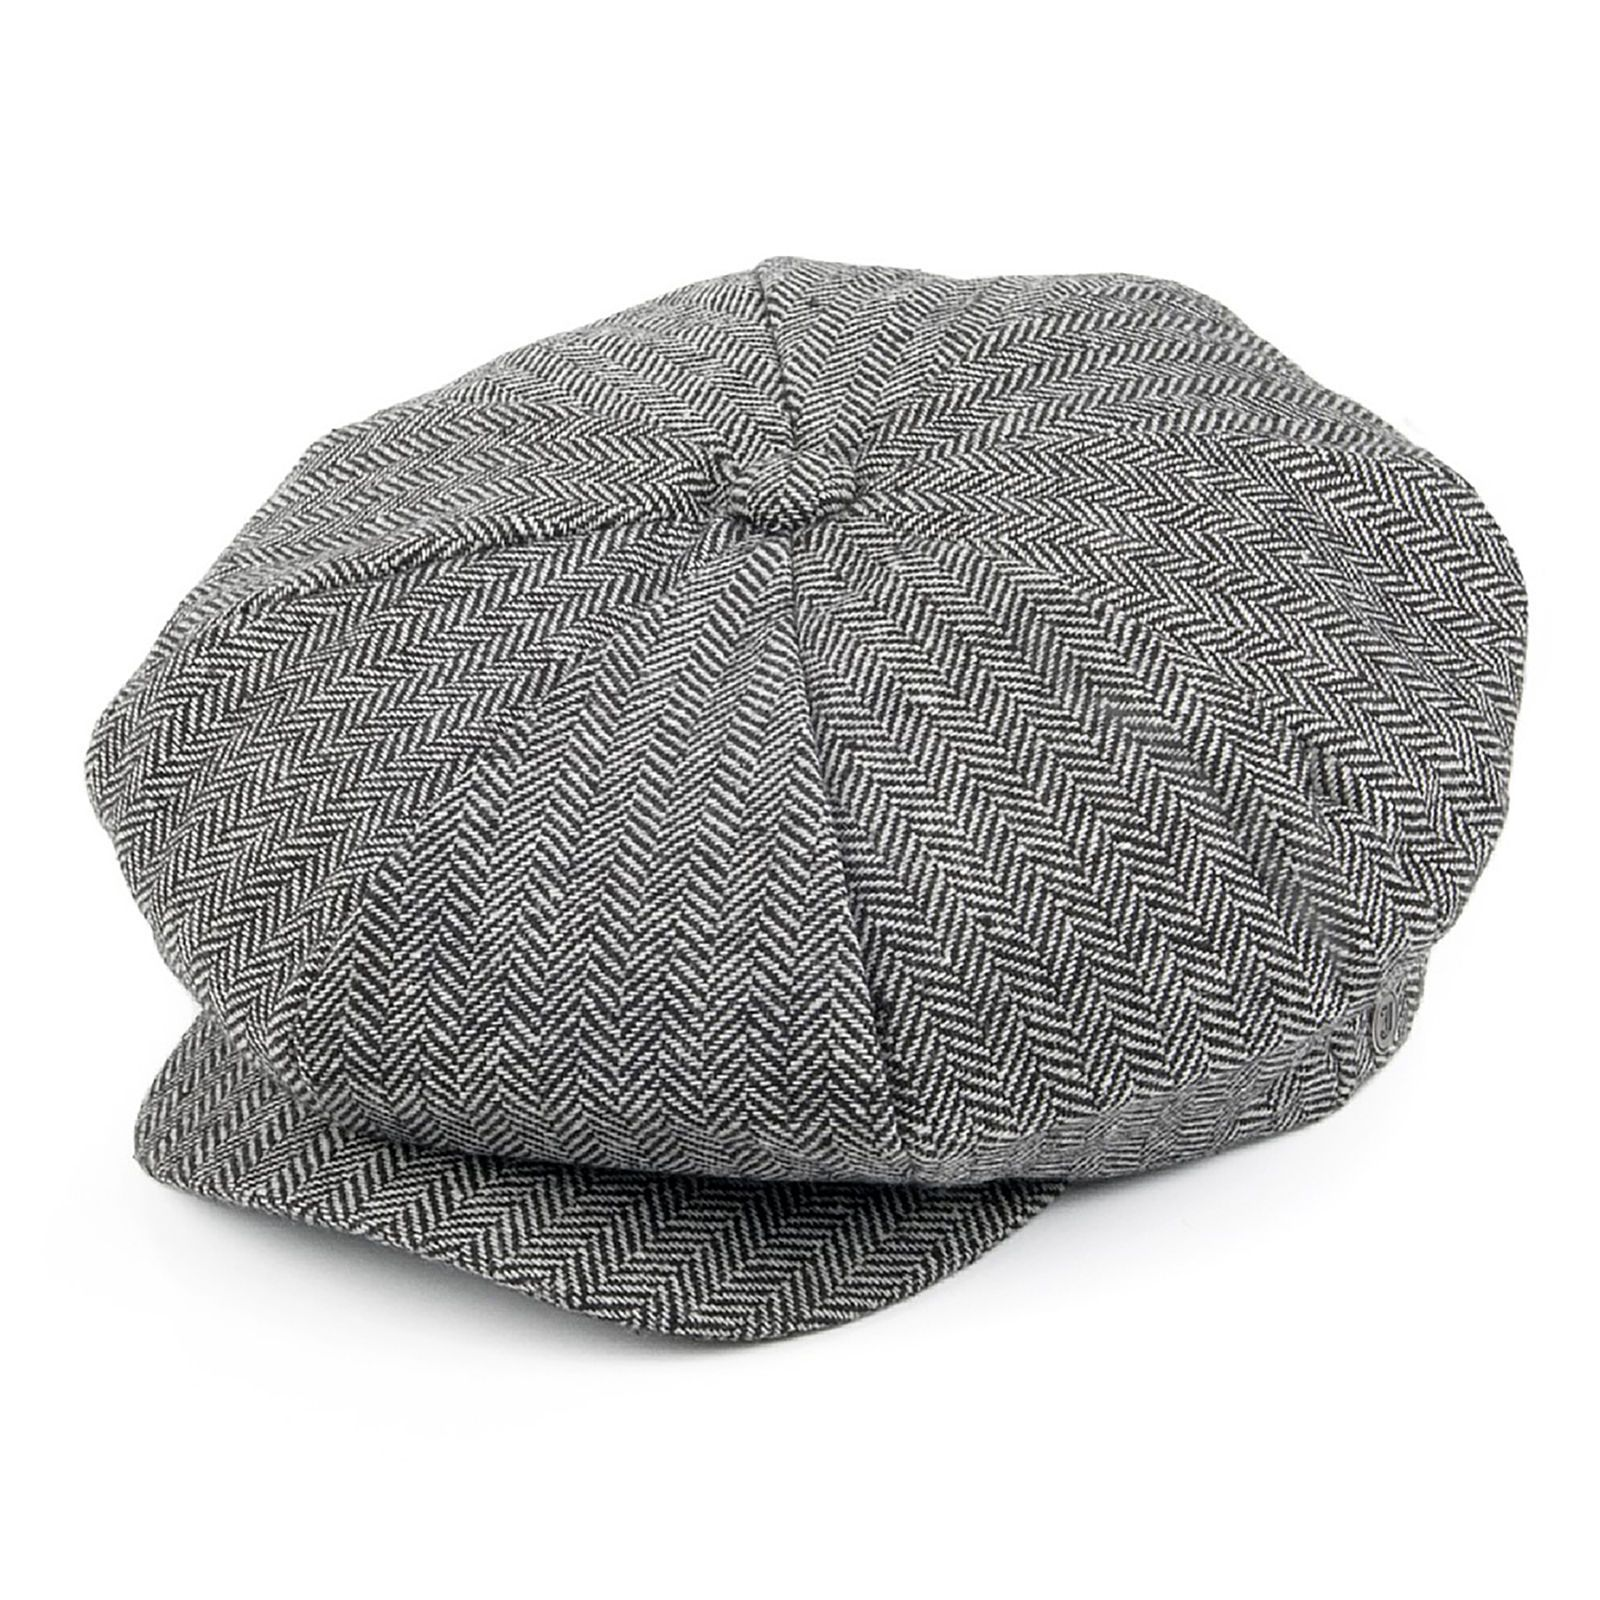 Mens Hats 163619  Jaxon Grey Herringbone Big Apple Newsboy Cap Peaky  Blinders Style Gatsby Hat -  BUY IT NOW ONLY   18.95 on eBay! a80cc5eeedb3